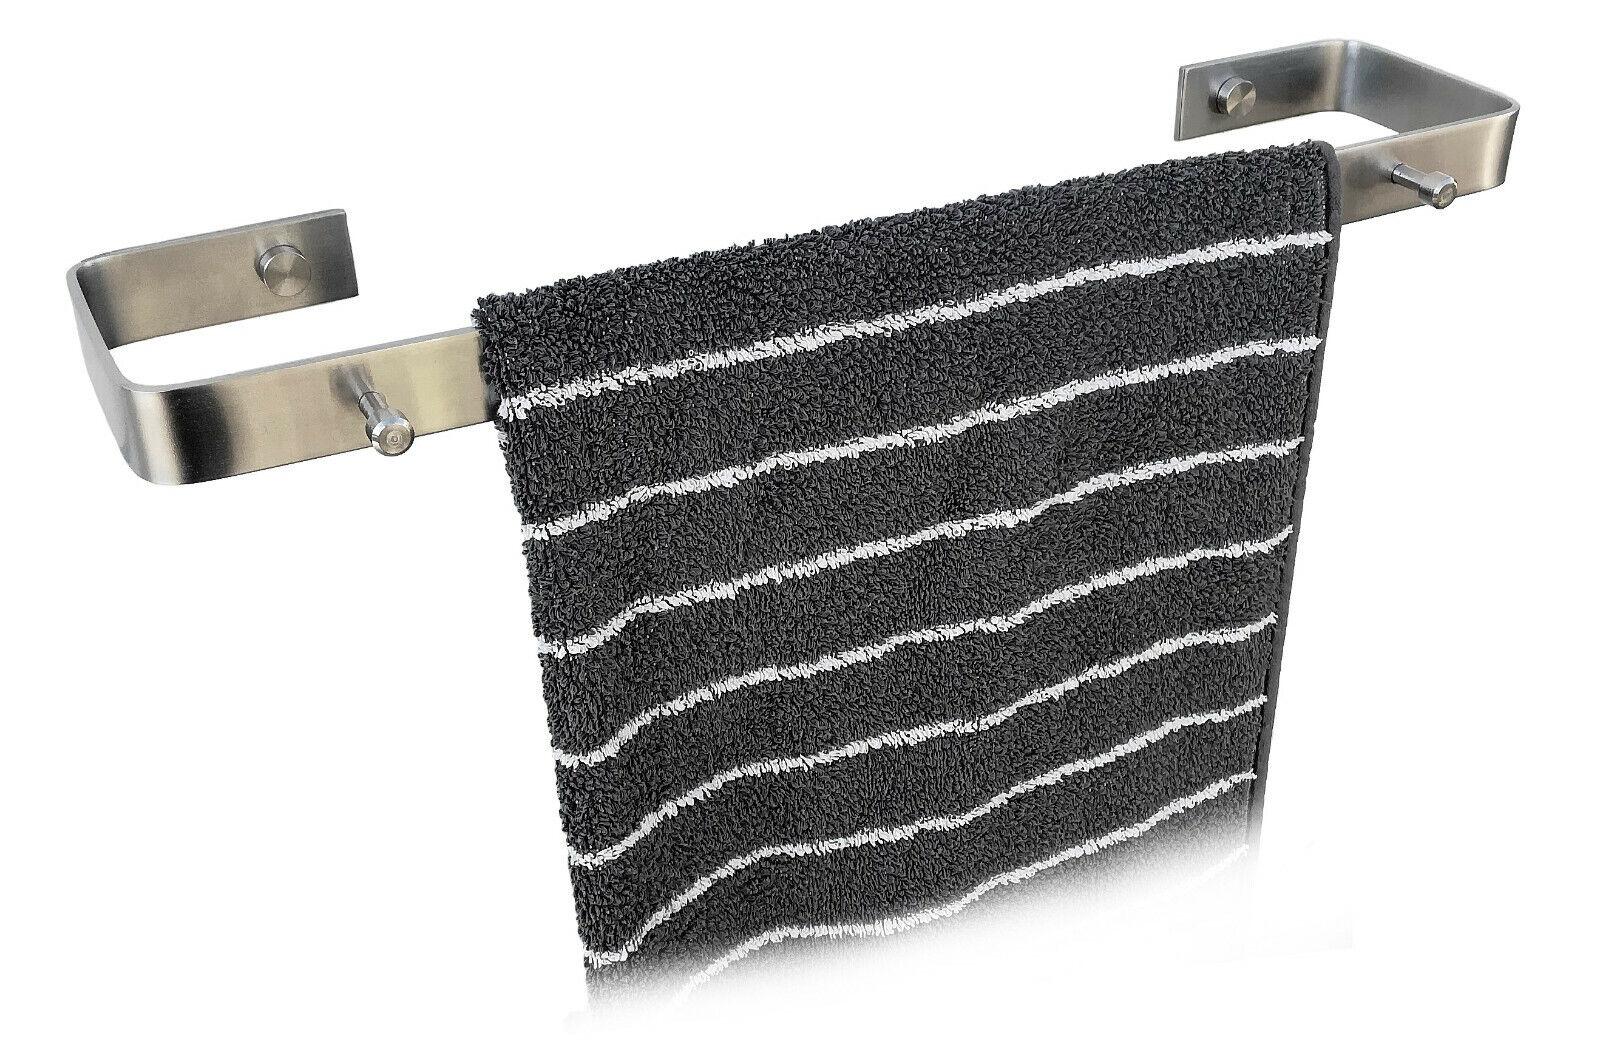 Handtuchhalter Edelstahl   Badetuchhalter Handtuchhaken   Bad Küche   Namor©